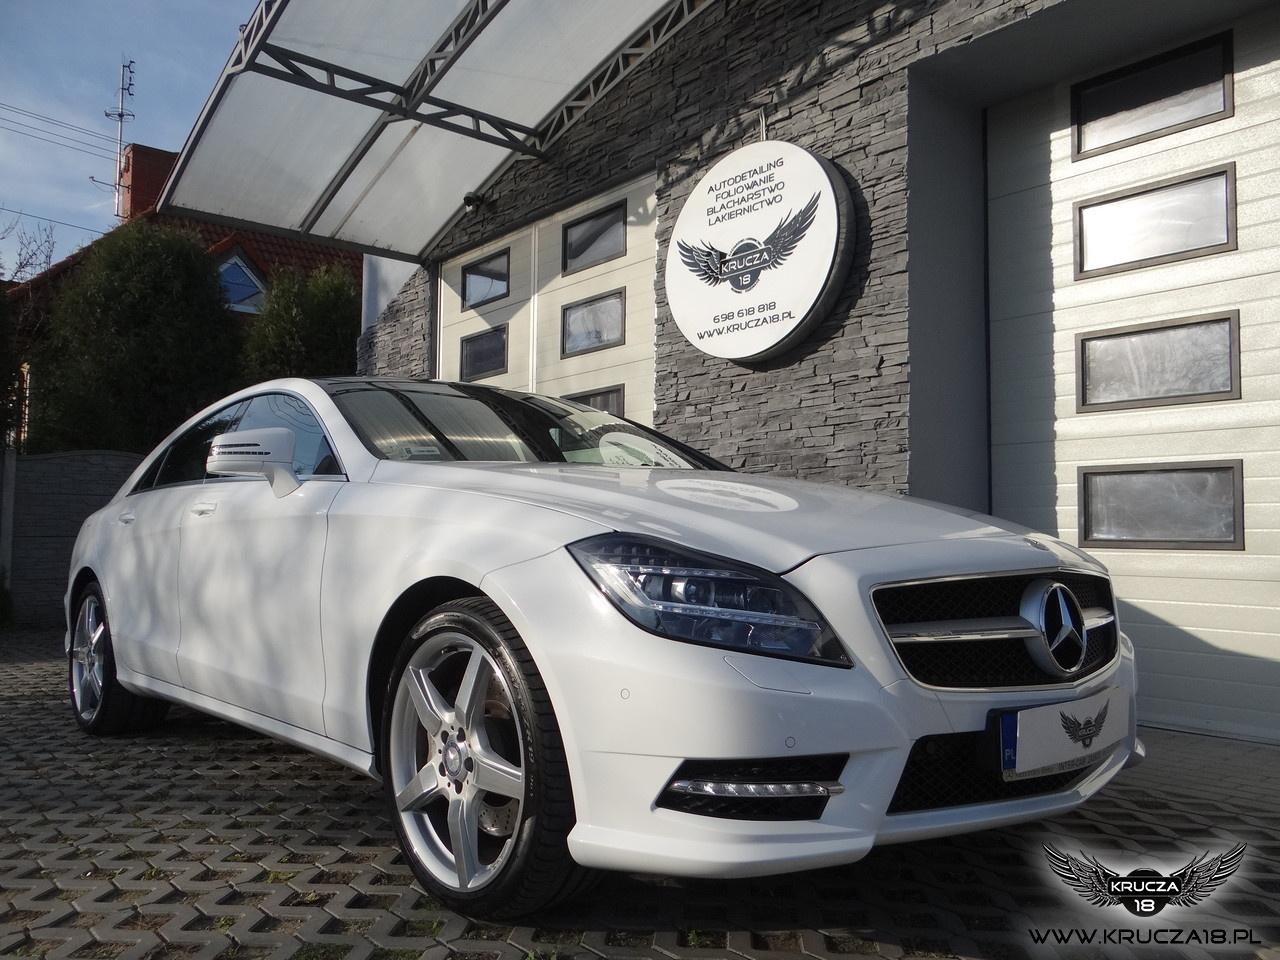 Mercedes CLS - White Metallic